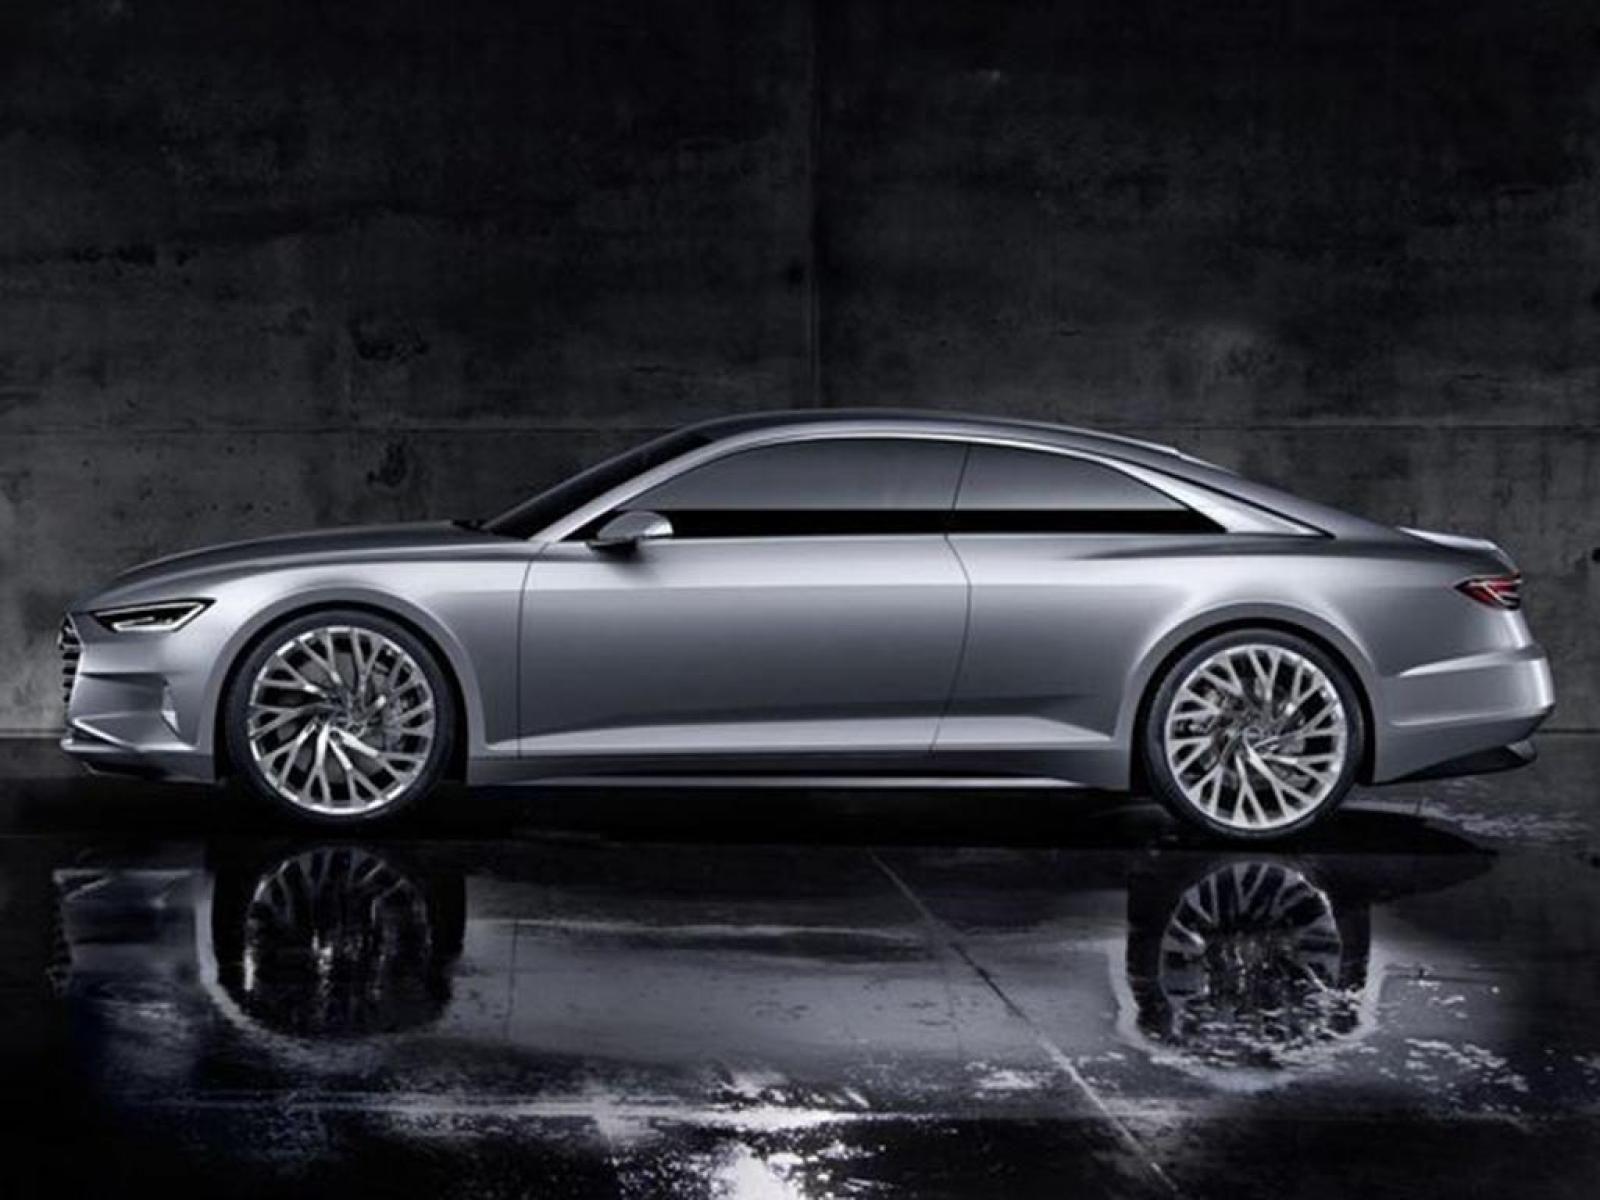 Kelebihan Kekurangan Audi A6 Coupe Murah Berkualitas